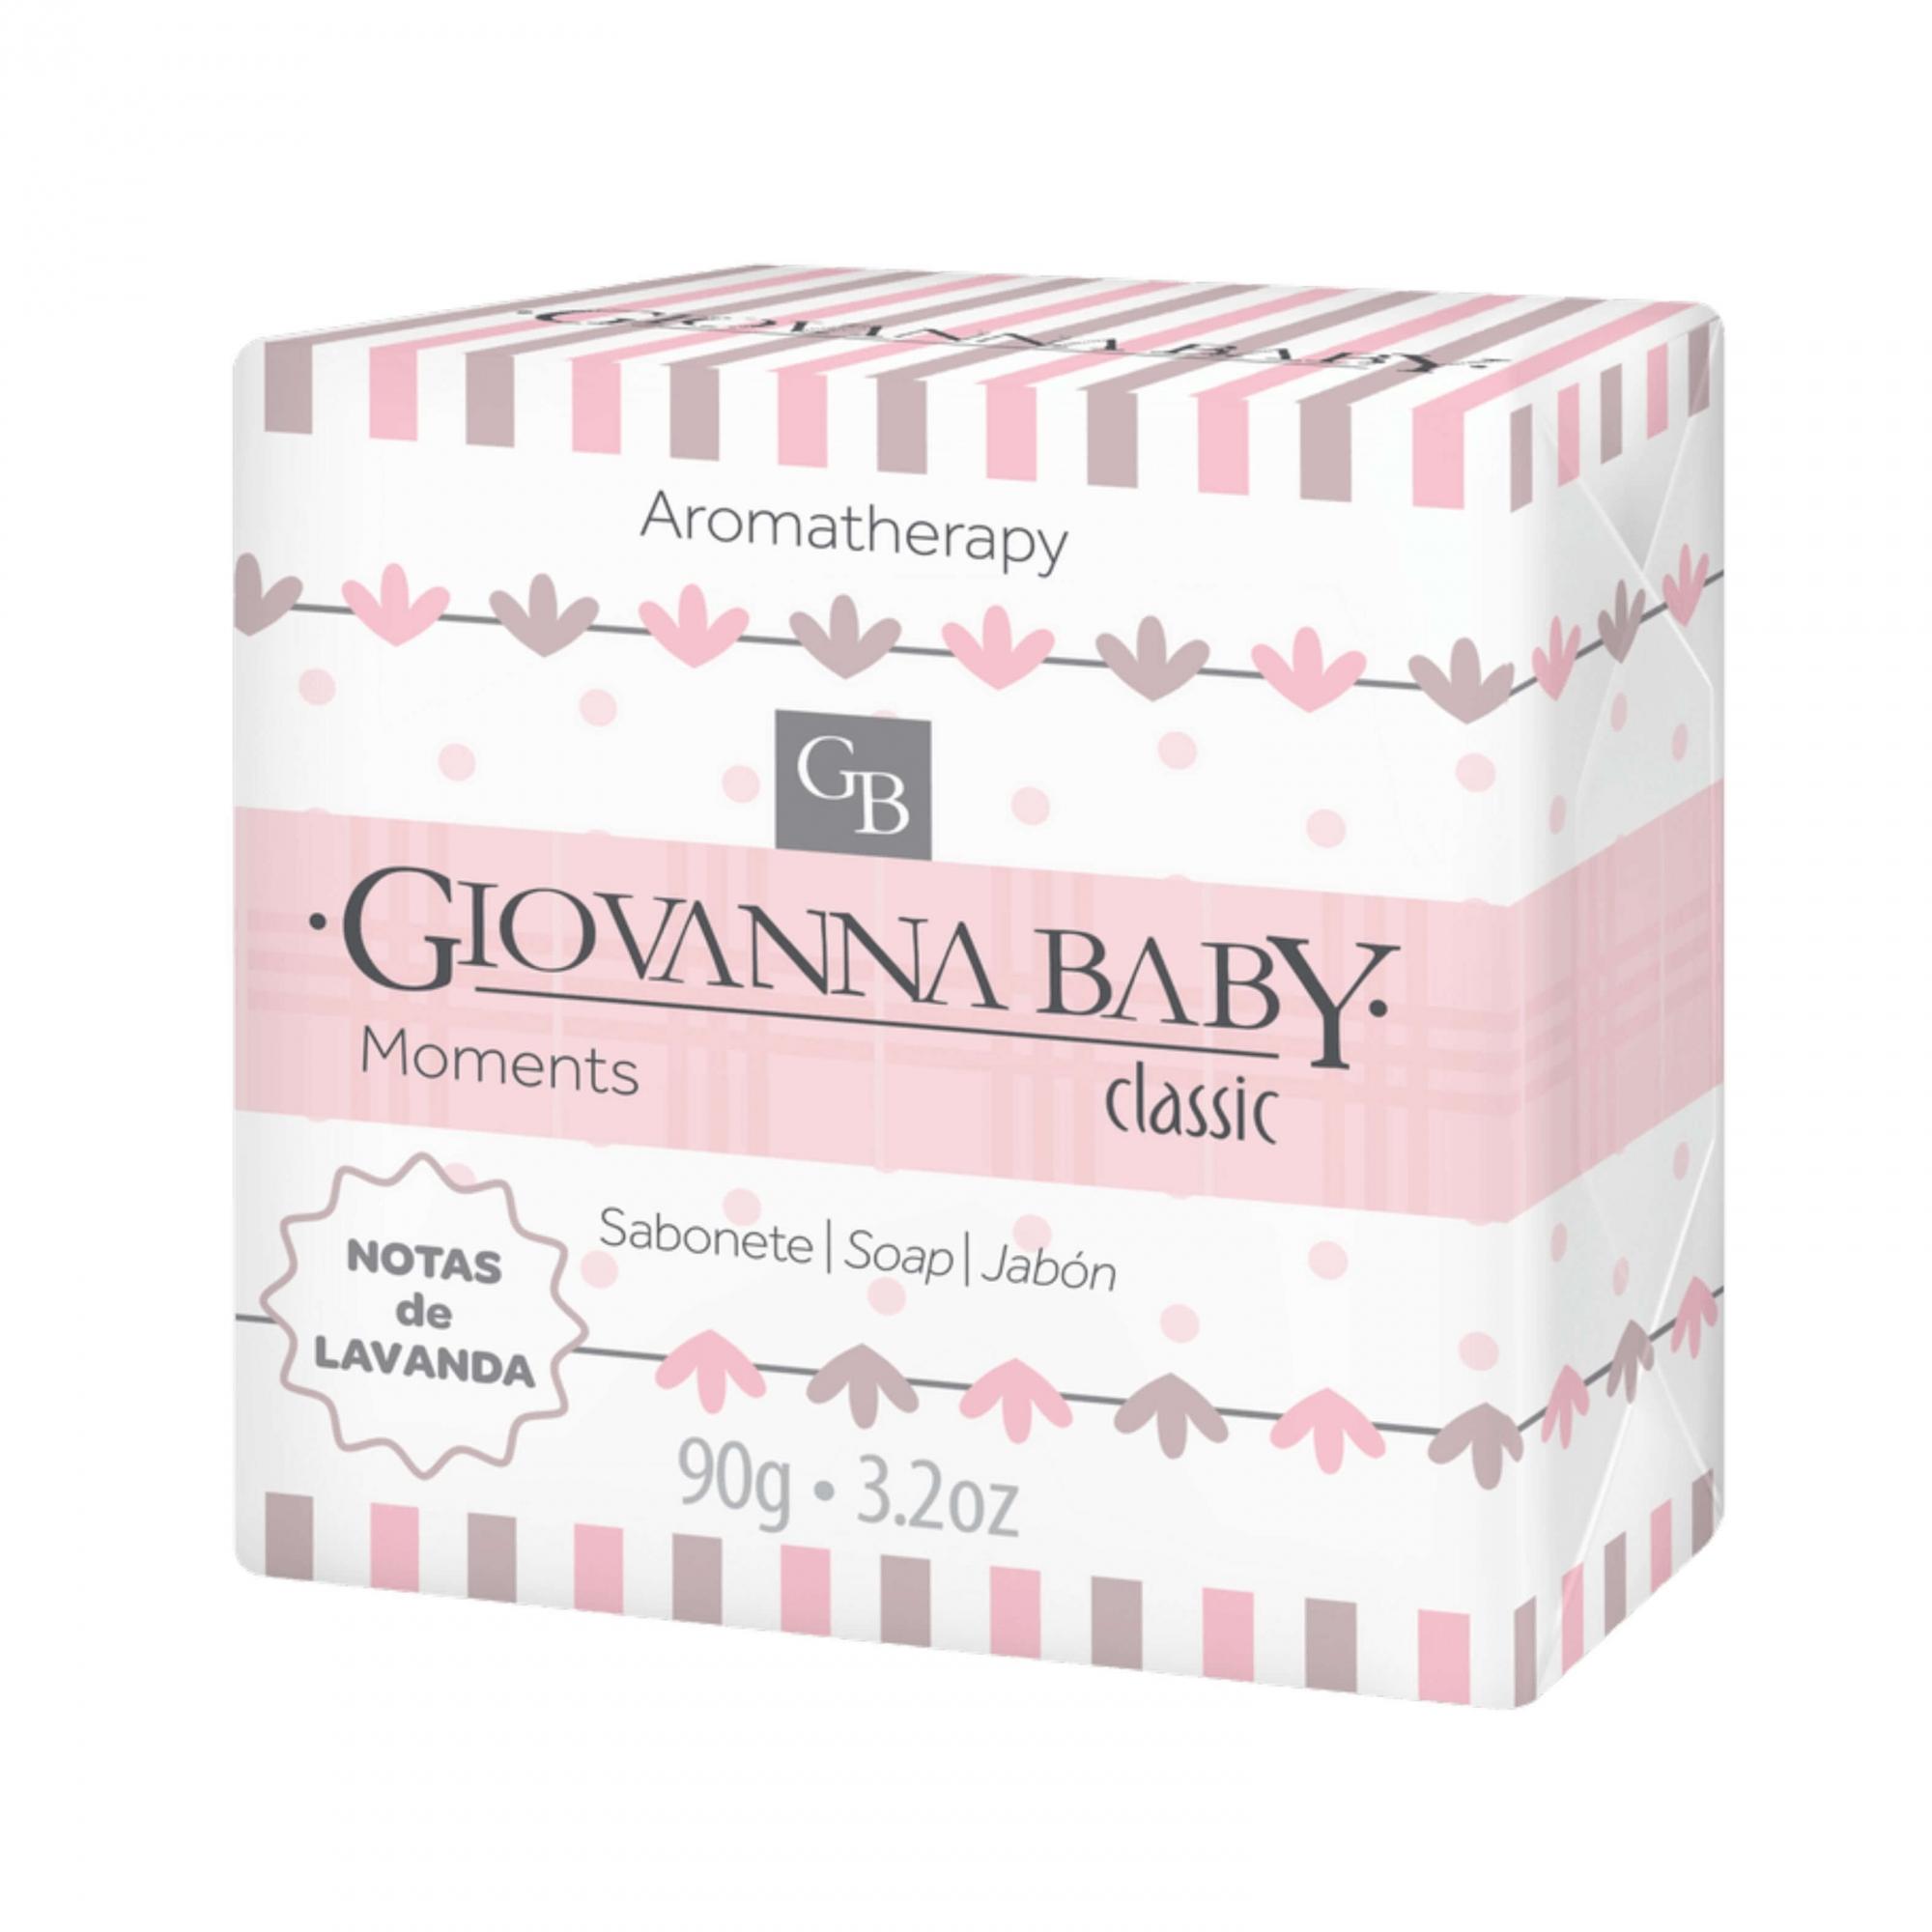 Sabonete Moments Classic Giovanna Baby 90g